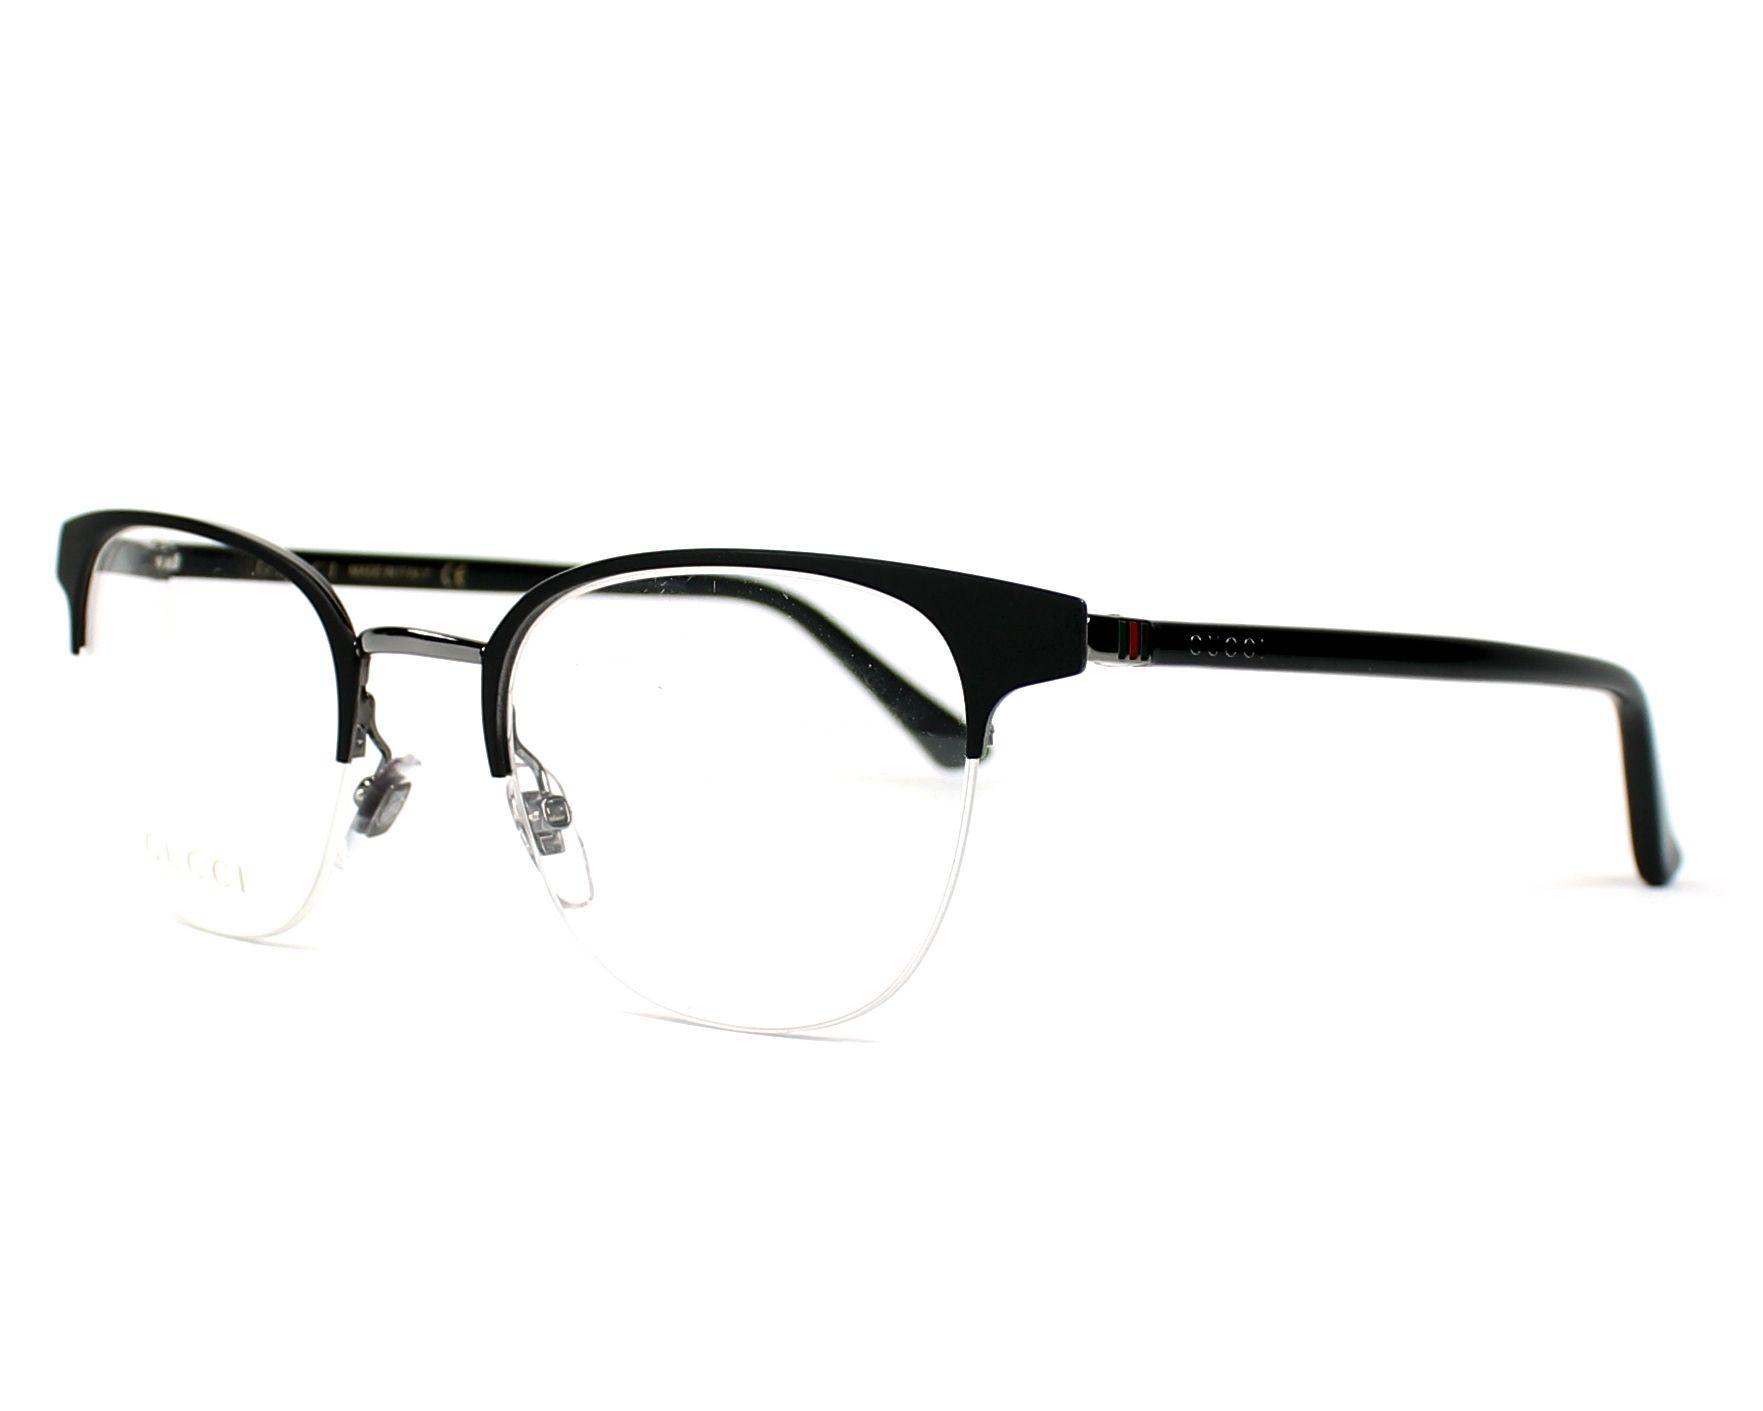 784c768aa4f eyeglasses Gucci GG-0020-O 001 49-21 Black Gun profile view